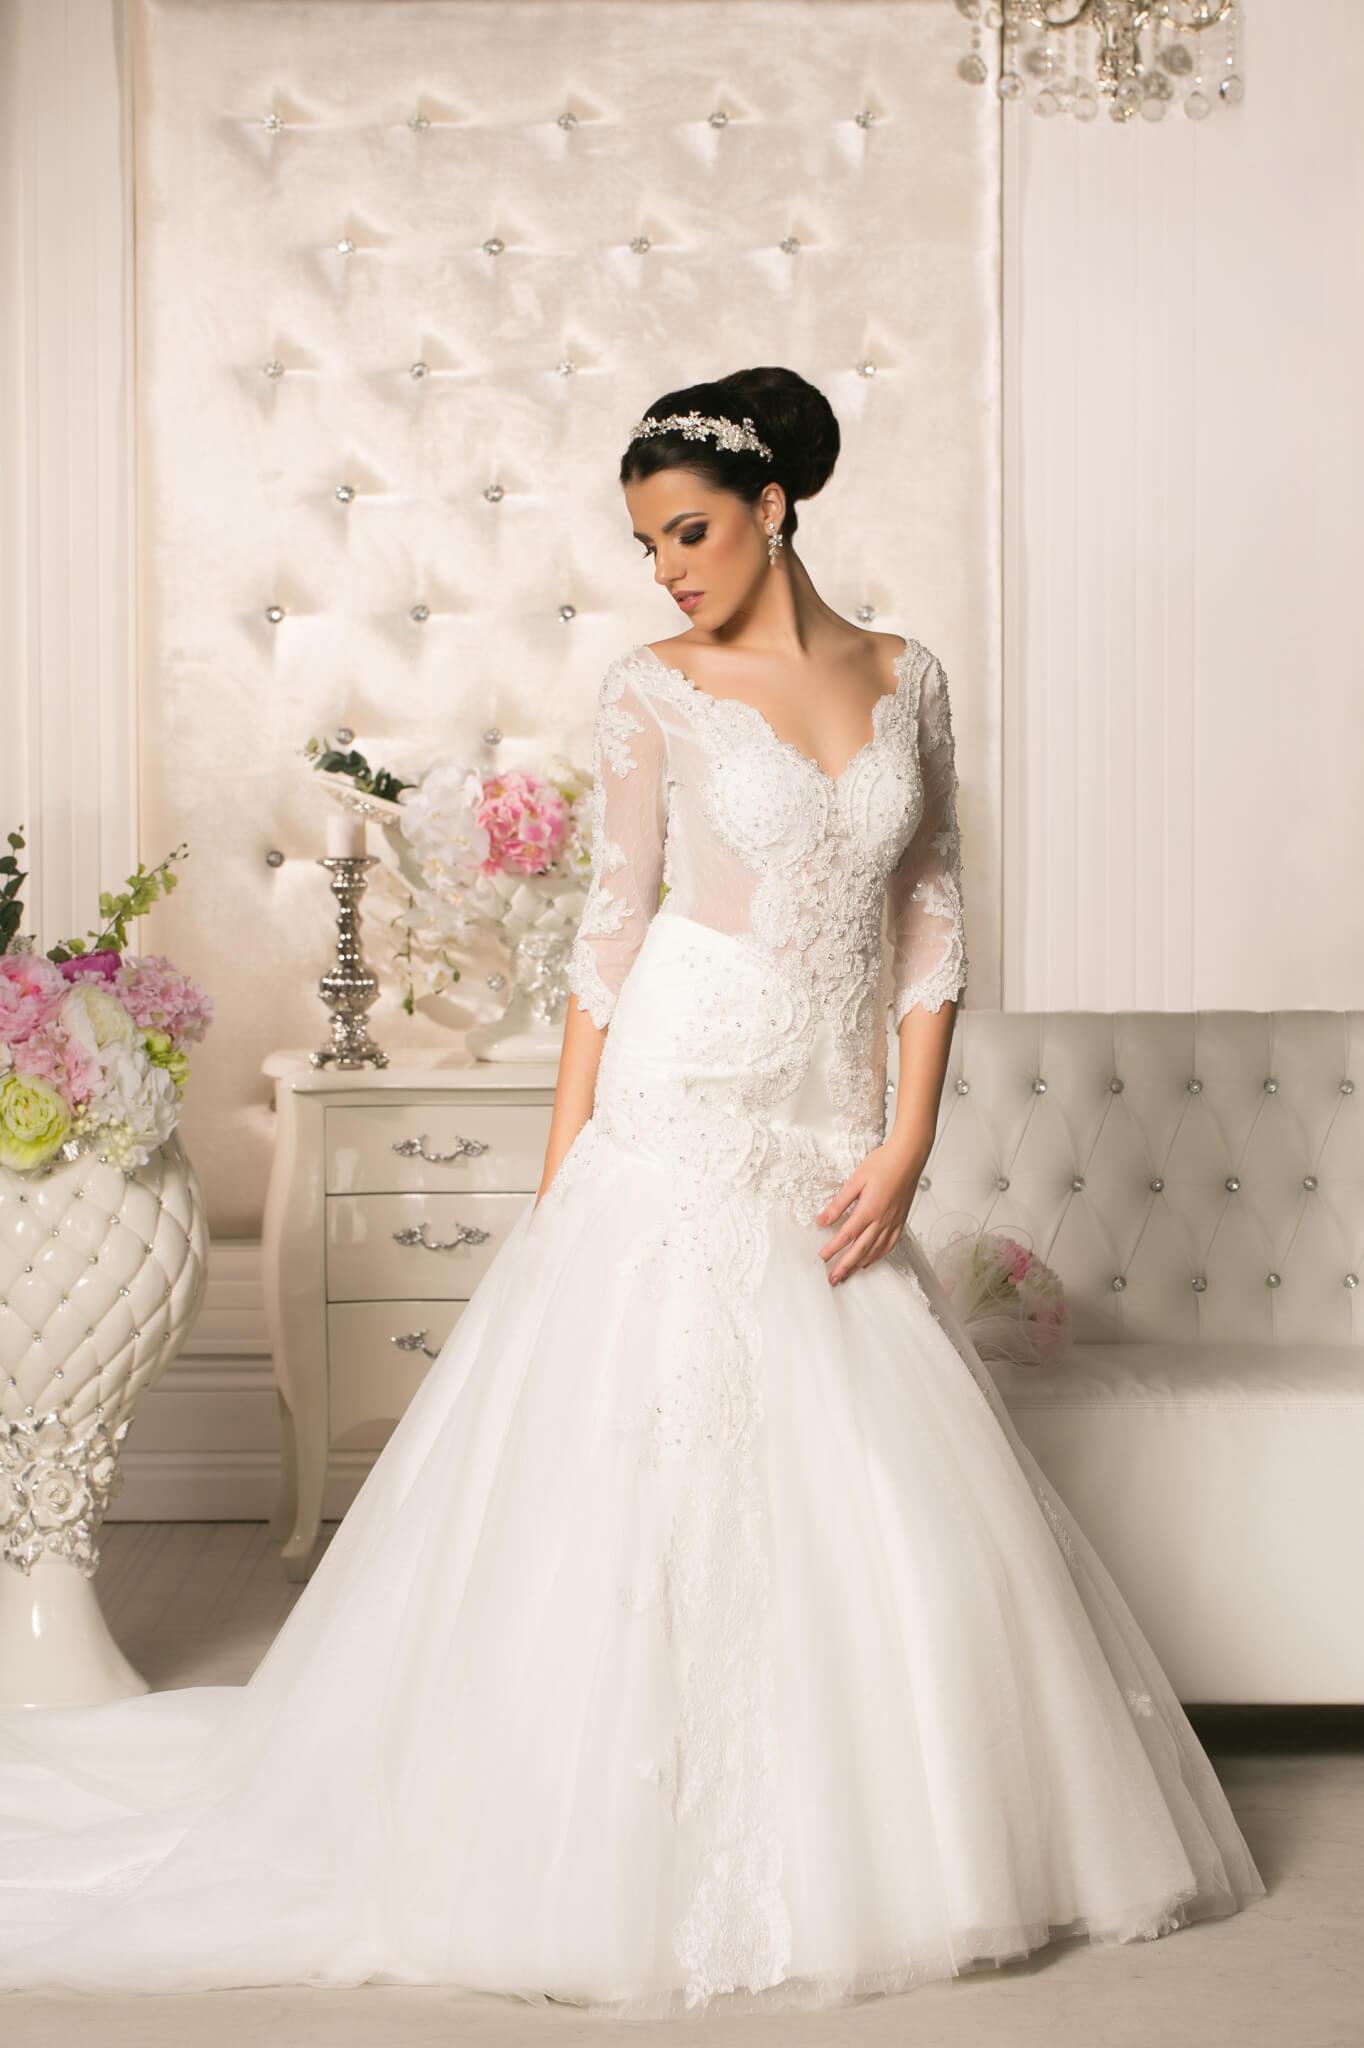 Wedding Dress alterations NYC